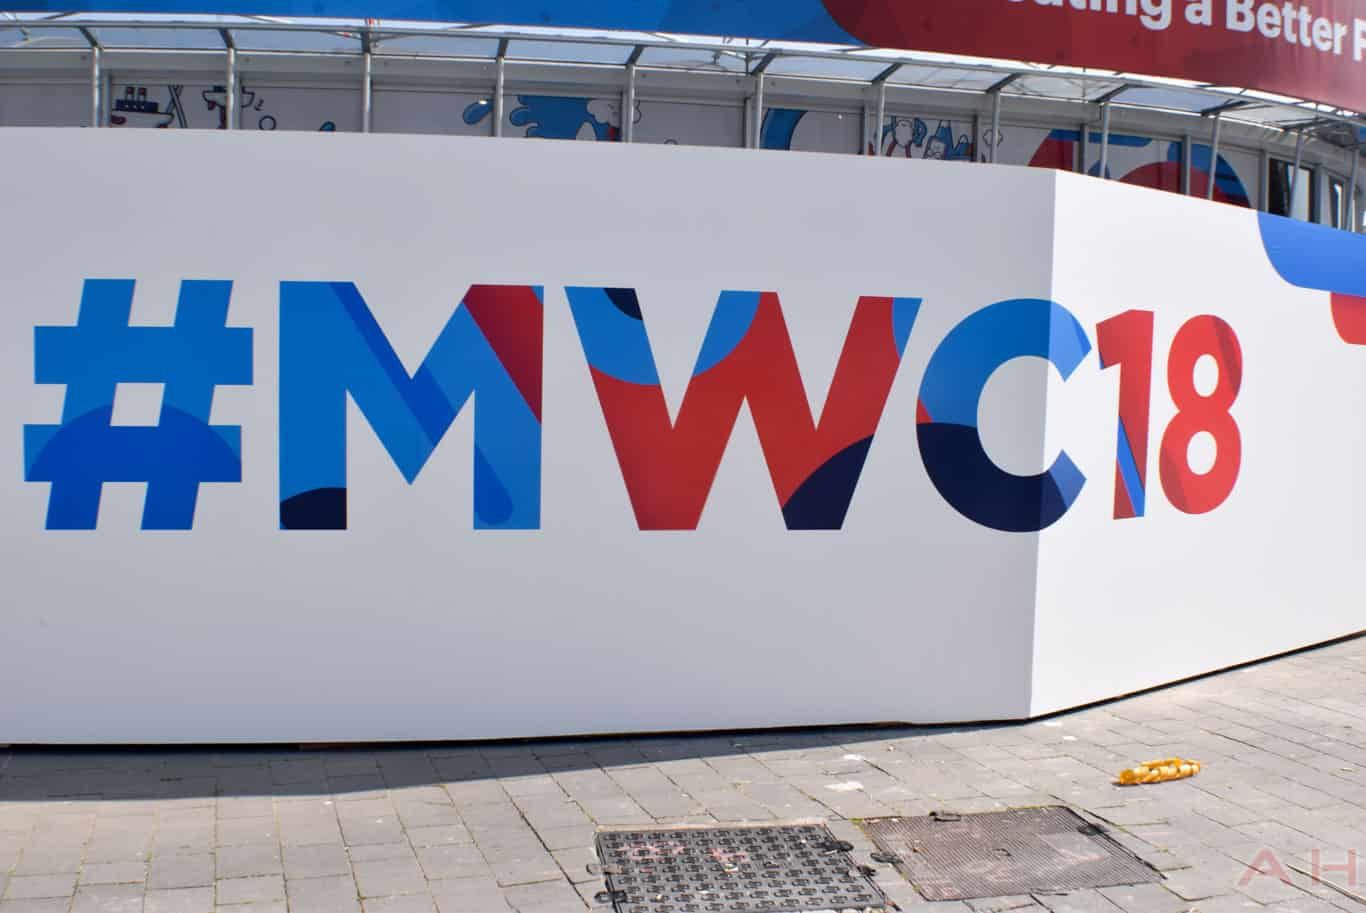 Mobile World Congress MWC 18 Logo AM AH 10